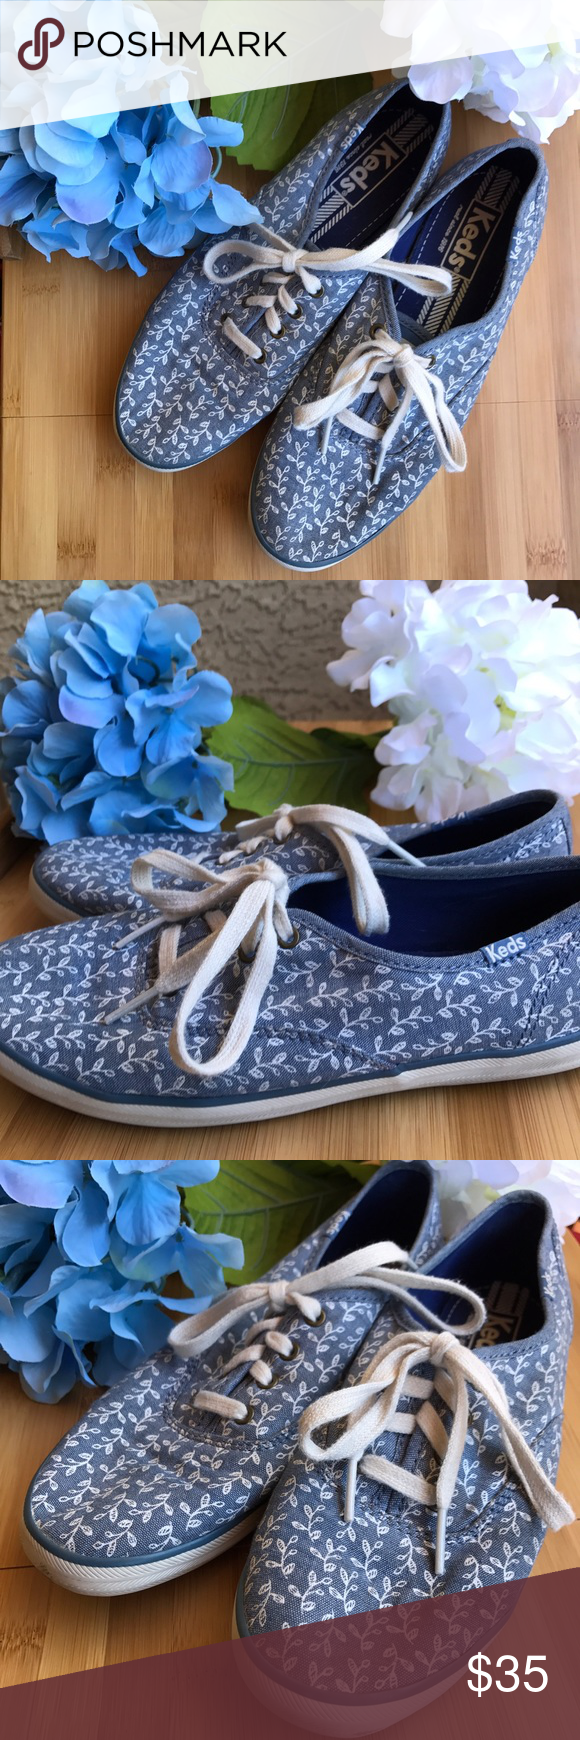 4f01d0ed38d2b Keds Blue Champion Botanical Leaves shoes Gorgeous like new Keds. Women s  Size 6. Beautiful